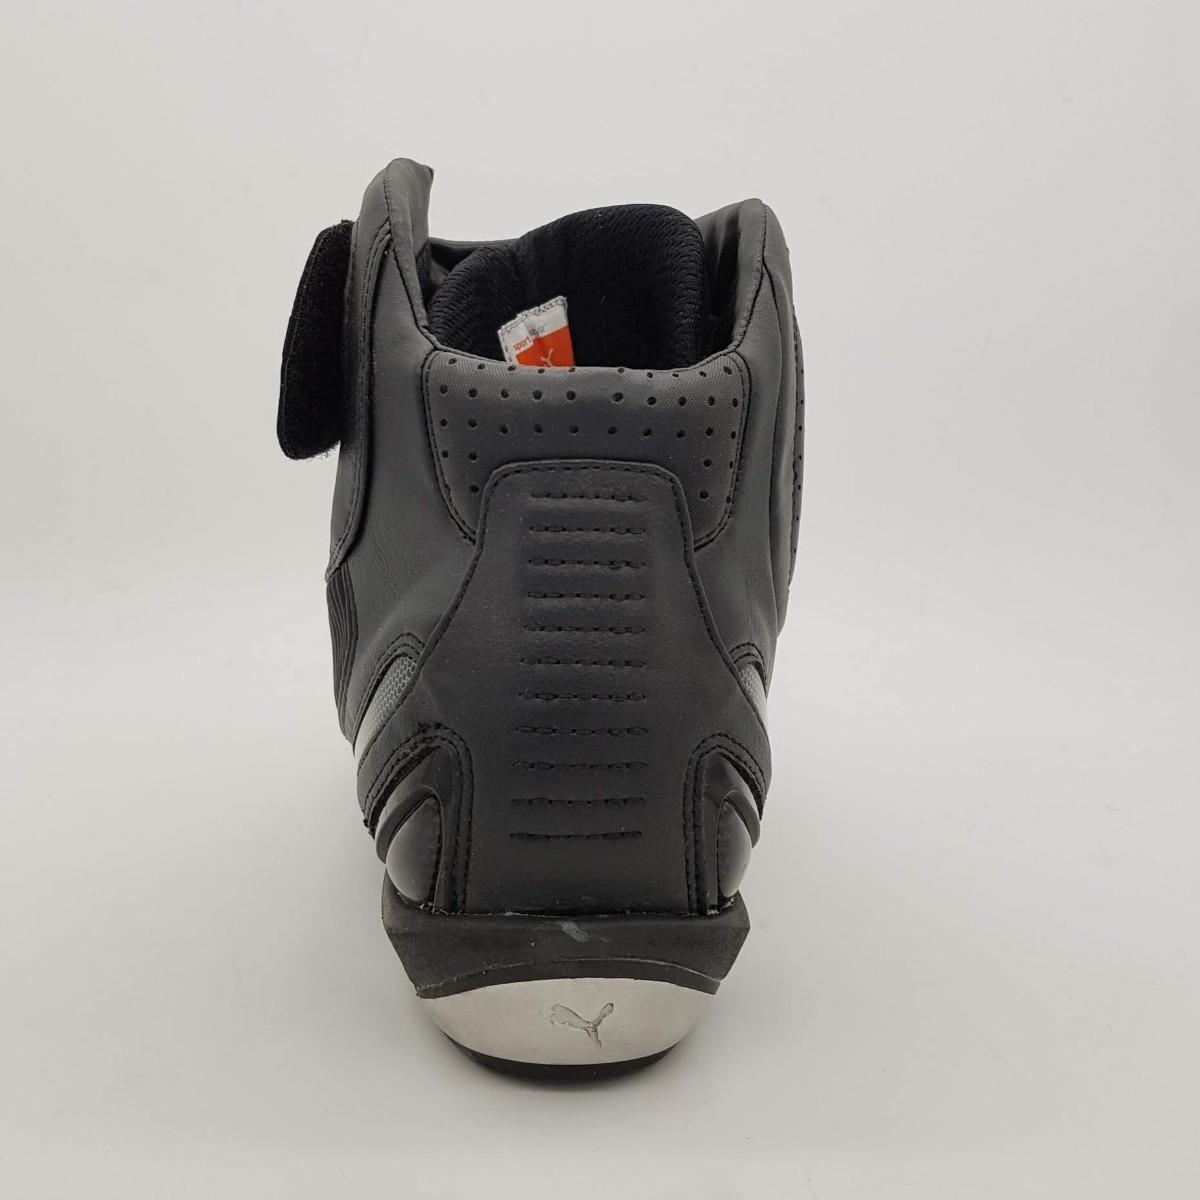 1cfc61ac70 tênis puma testastretta 2 mid branca bota puma oferta. Carregando zoom.